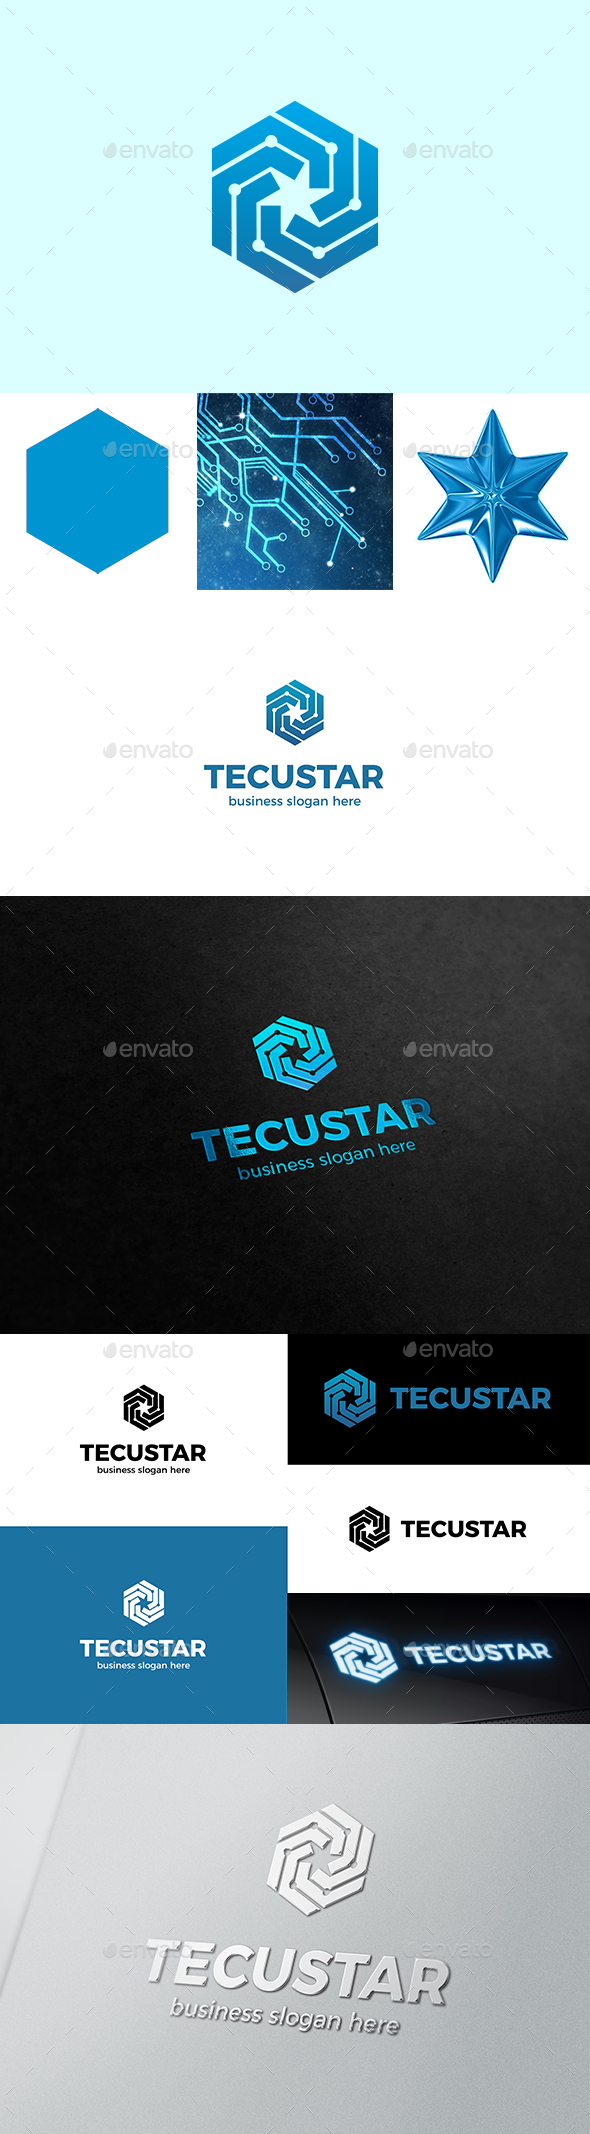 Tech Hexagon and Star Form Inside